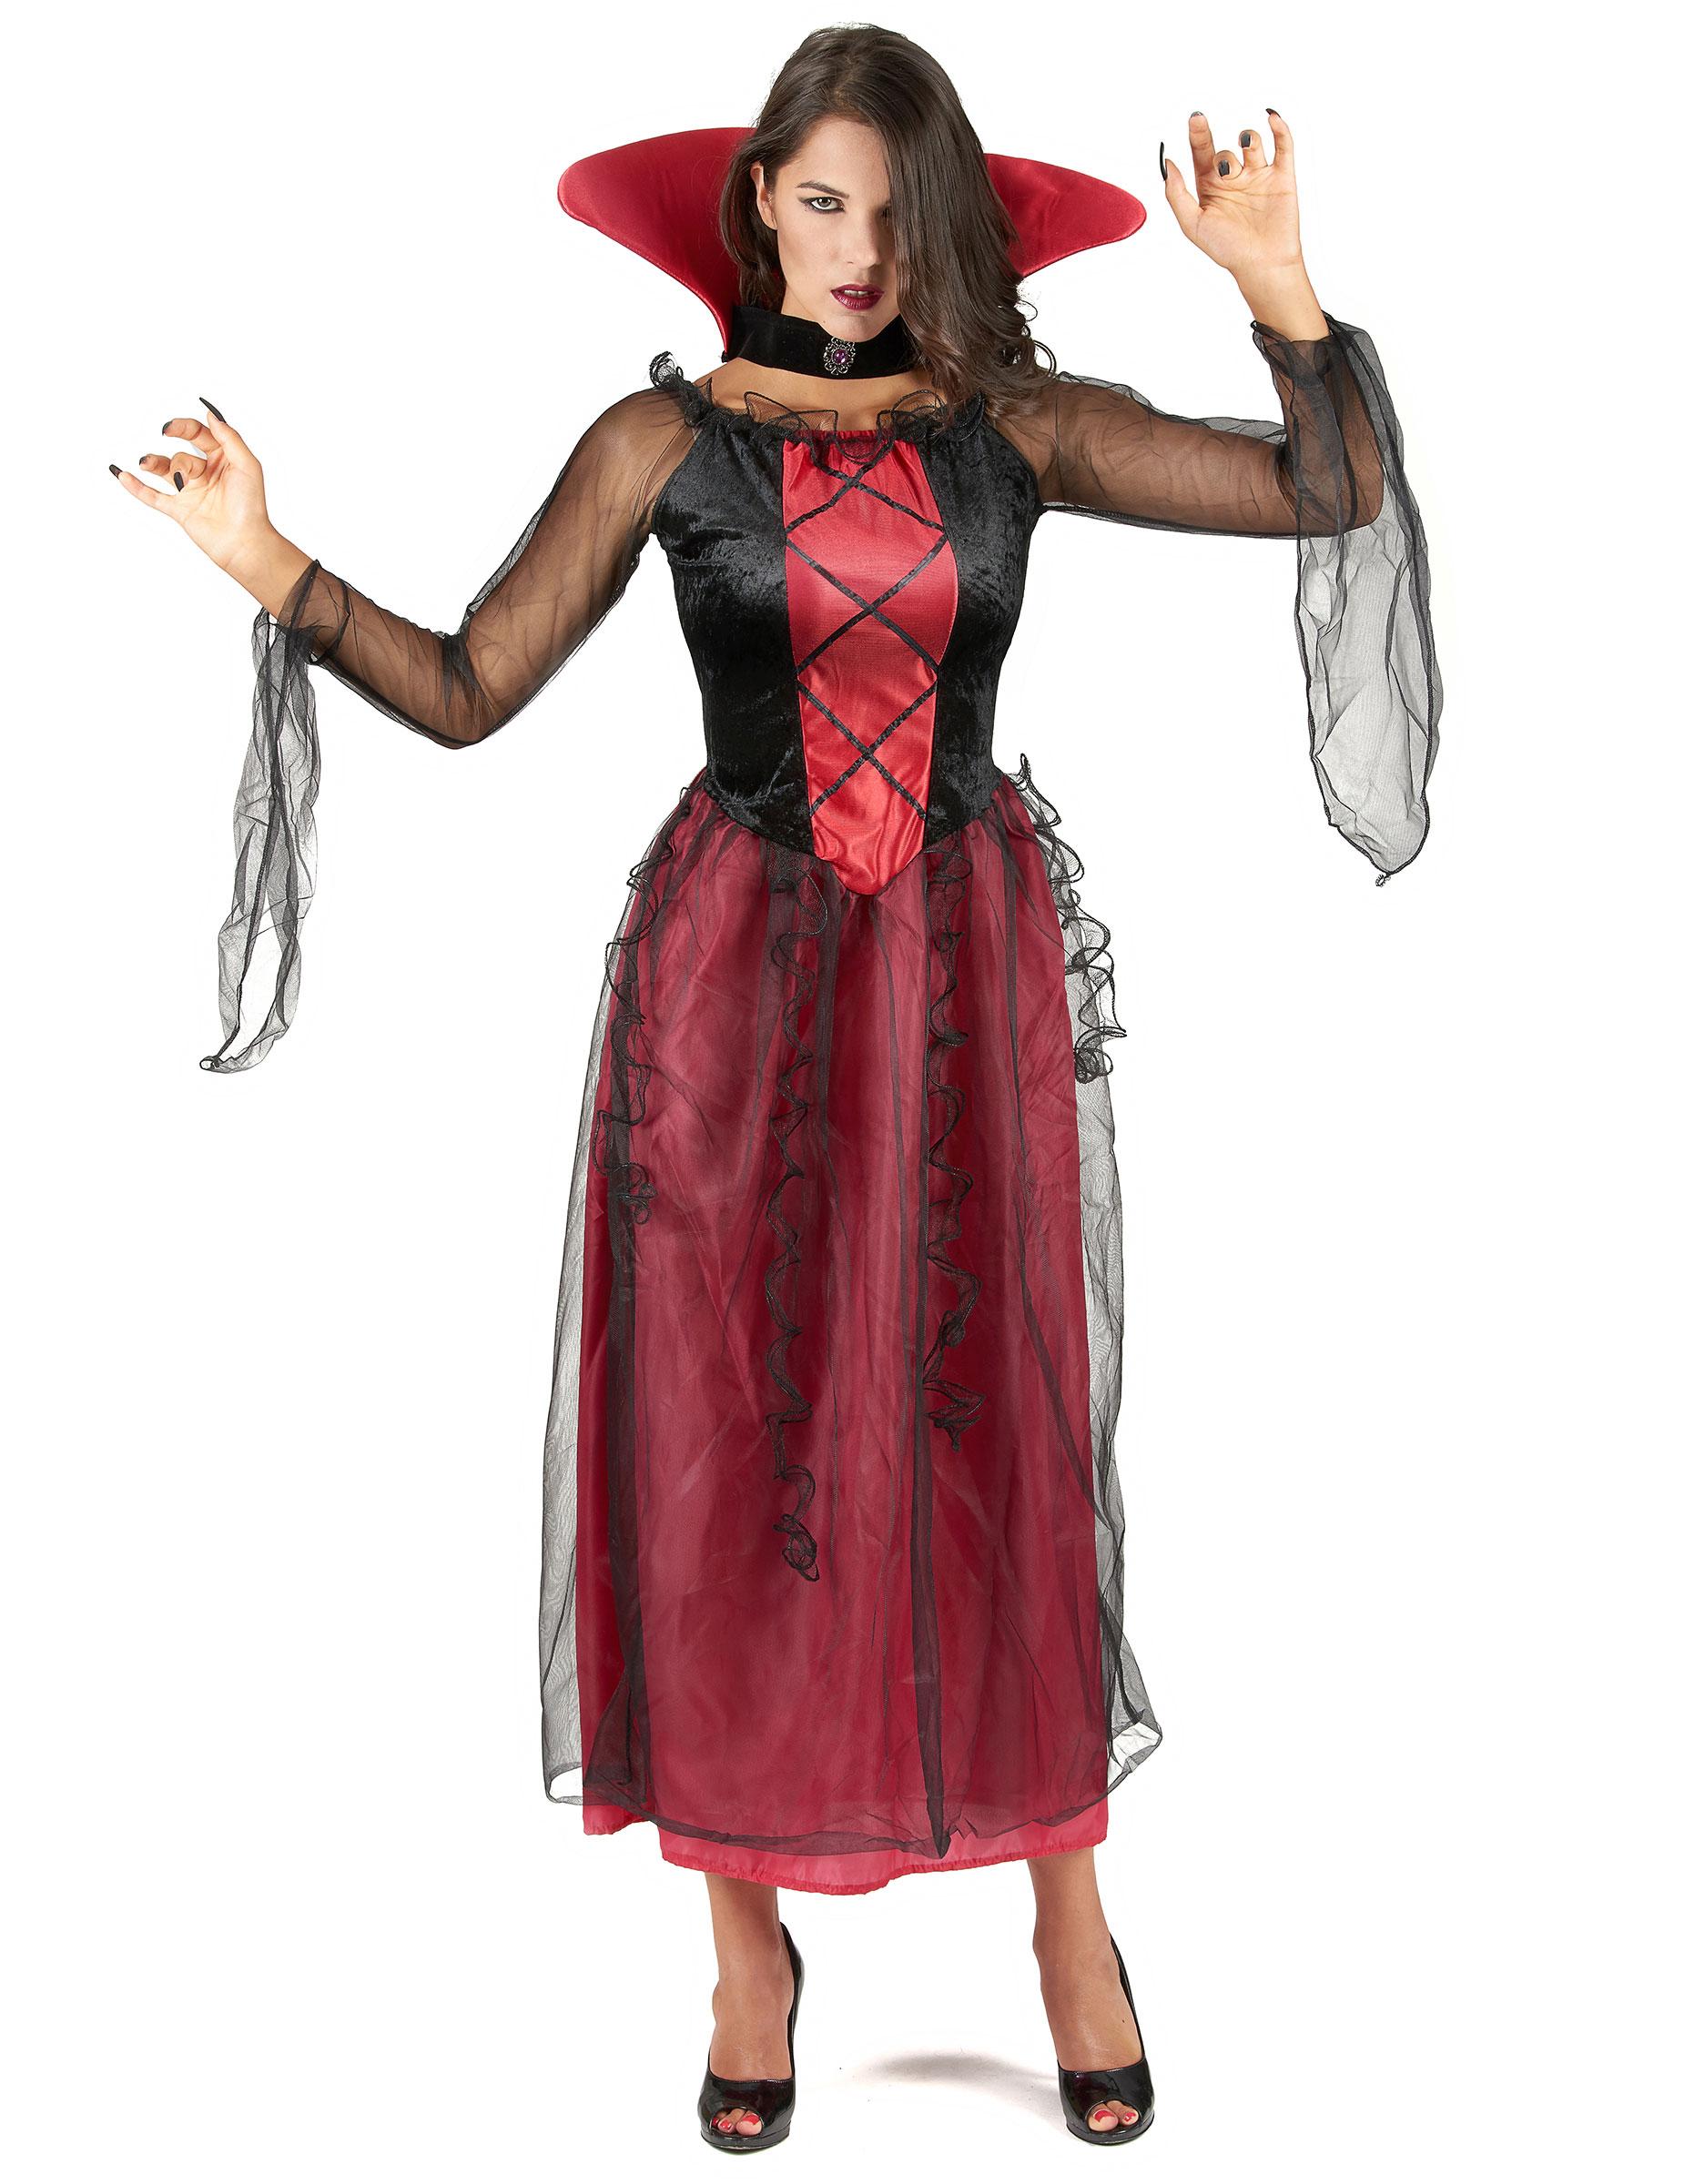 Halloween Kleding Dames.Verkleedkostuum Vampier Voor Dames Halloween Kleding